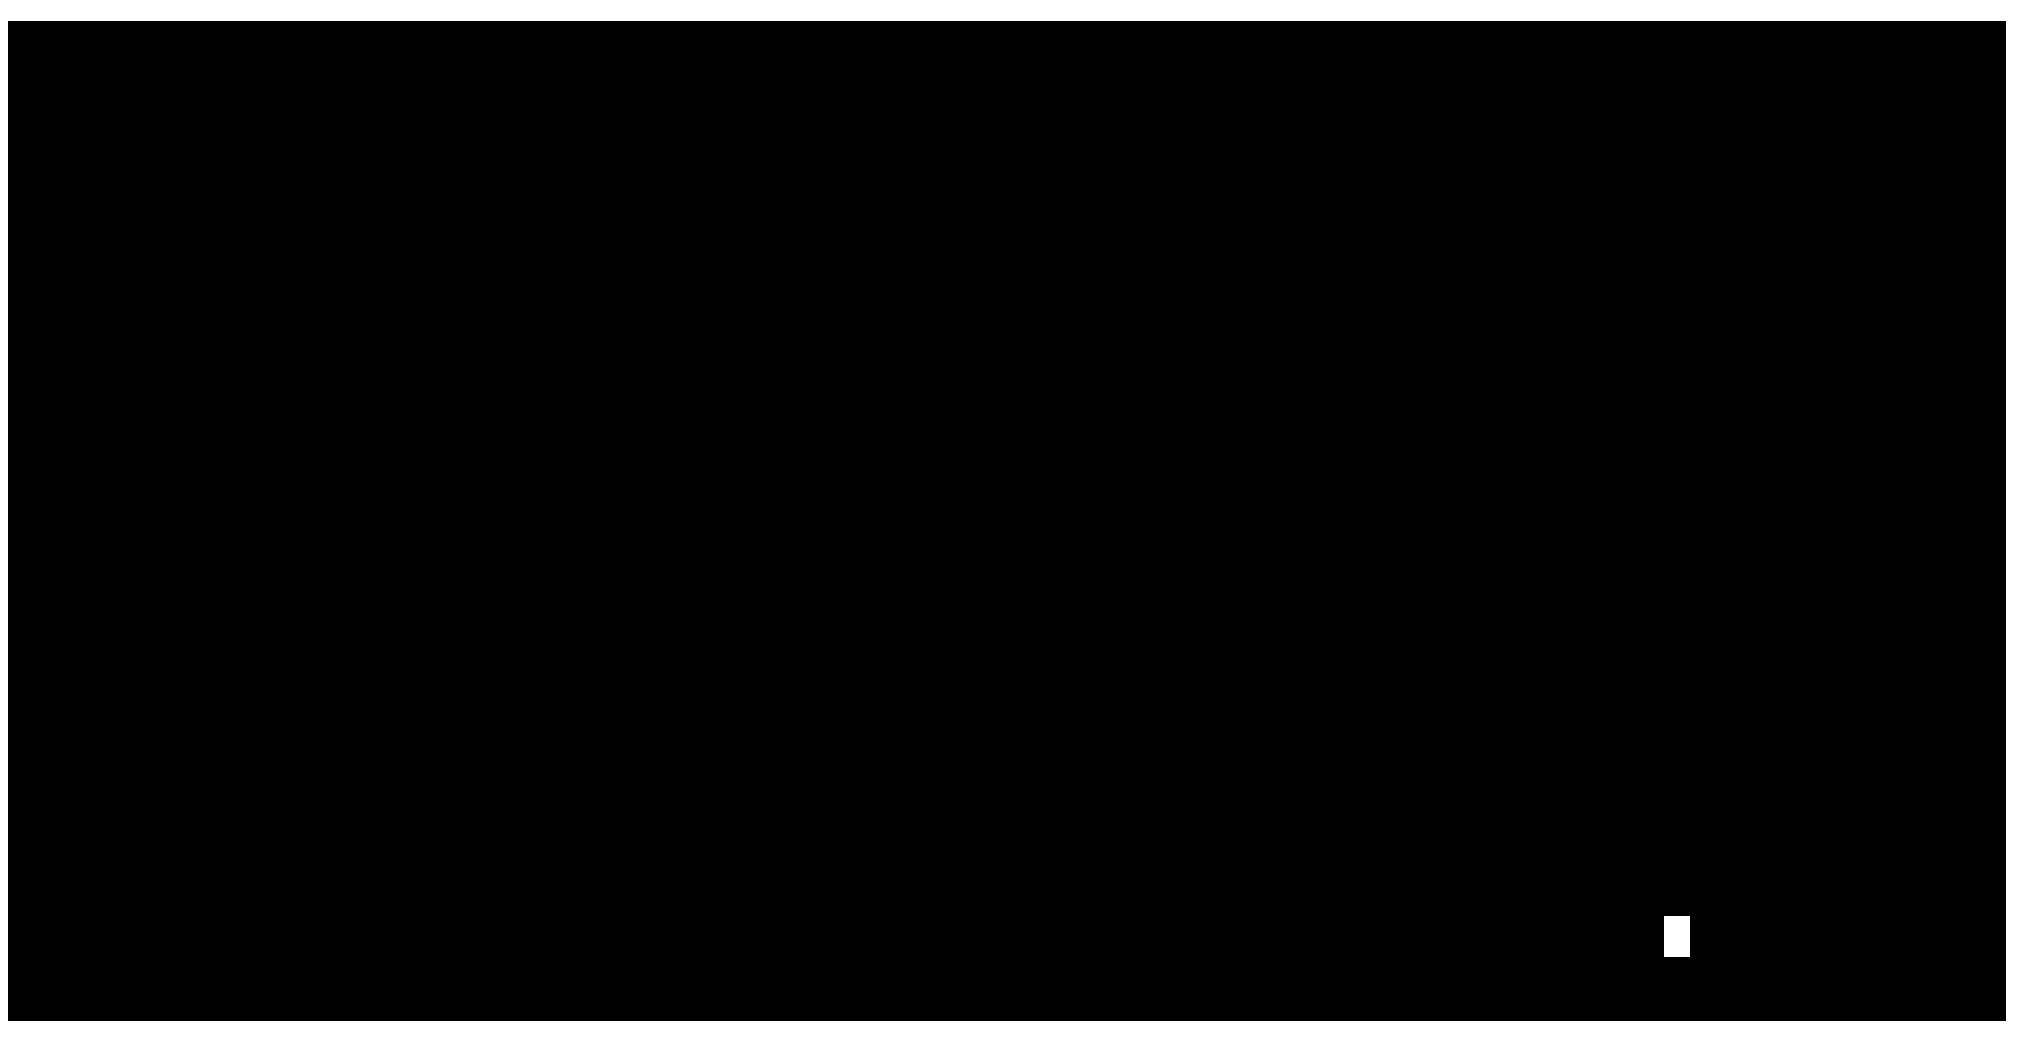 产品型号.png